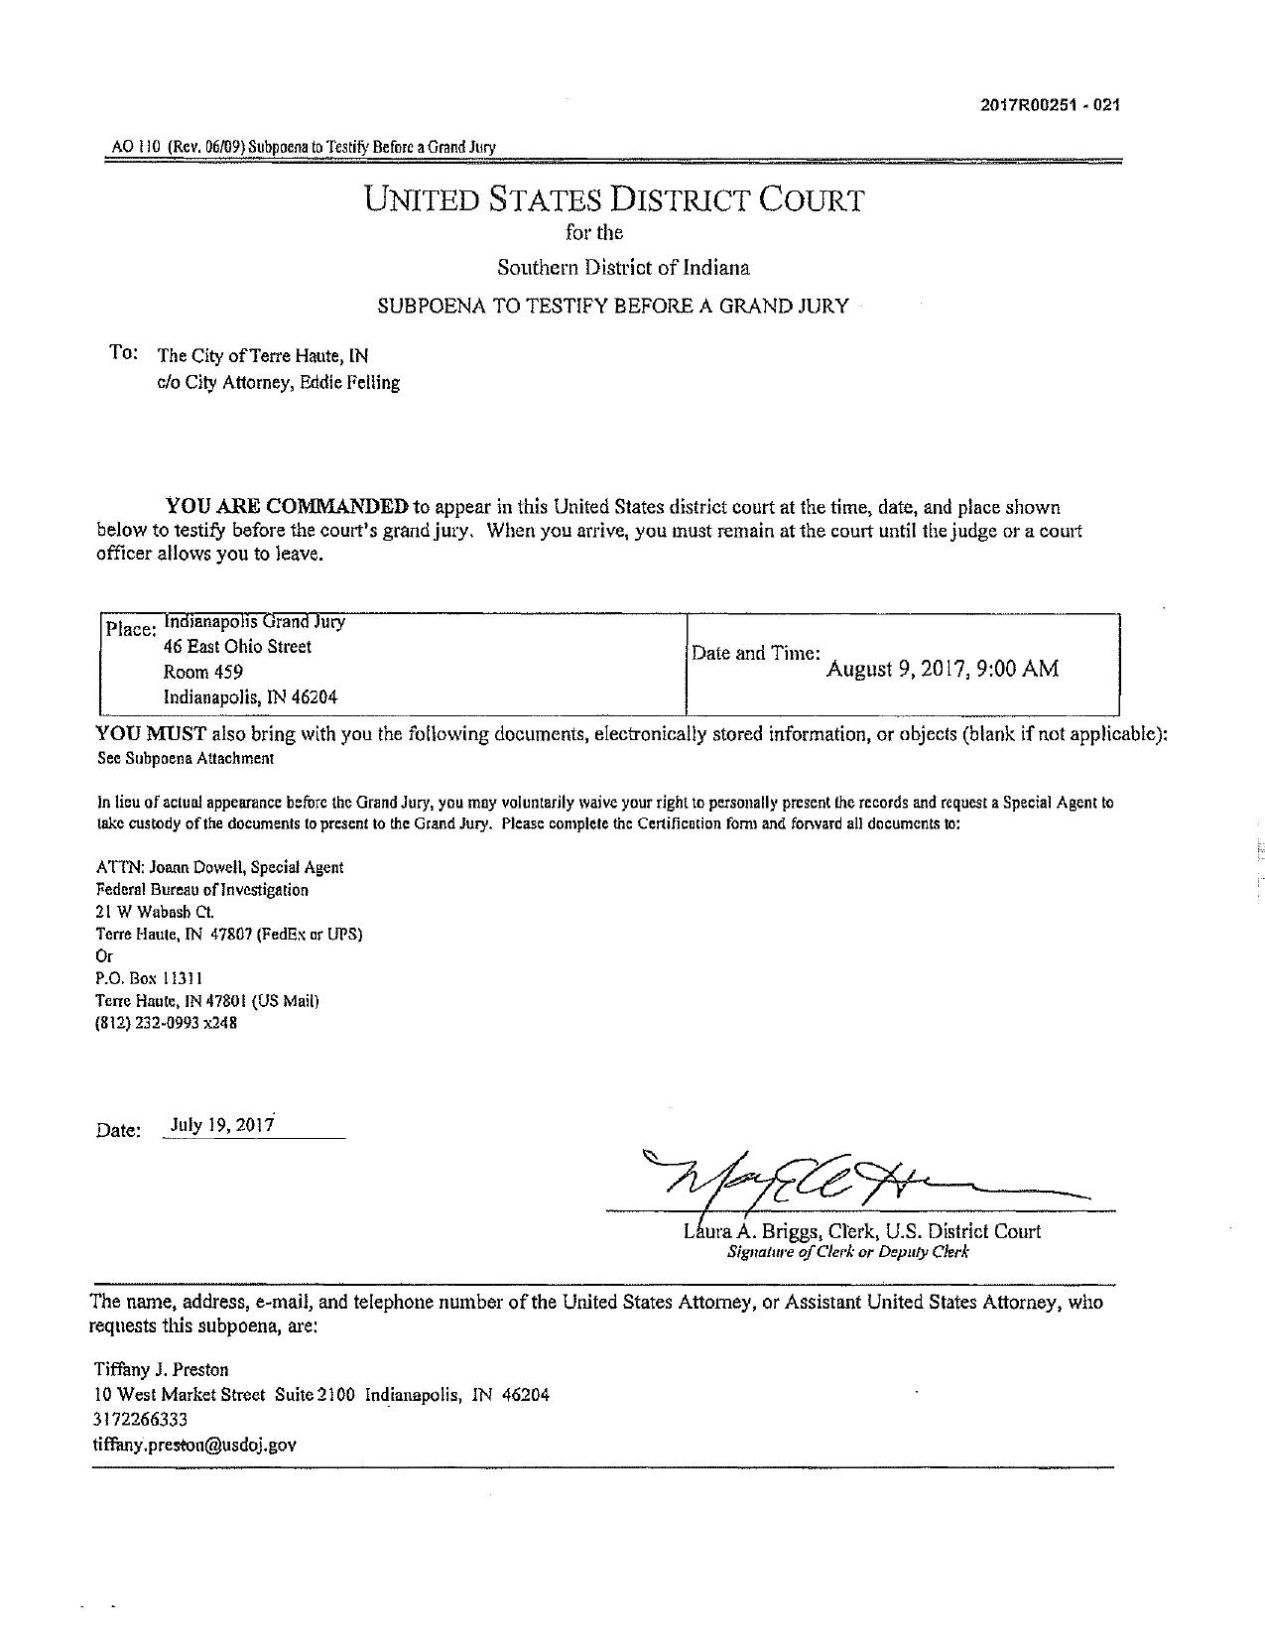 City Document Grand Jury Subpoena Tribstar Com